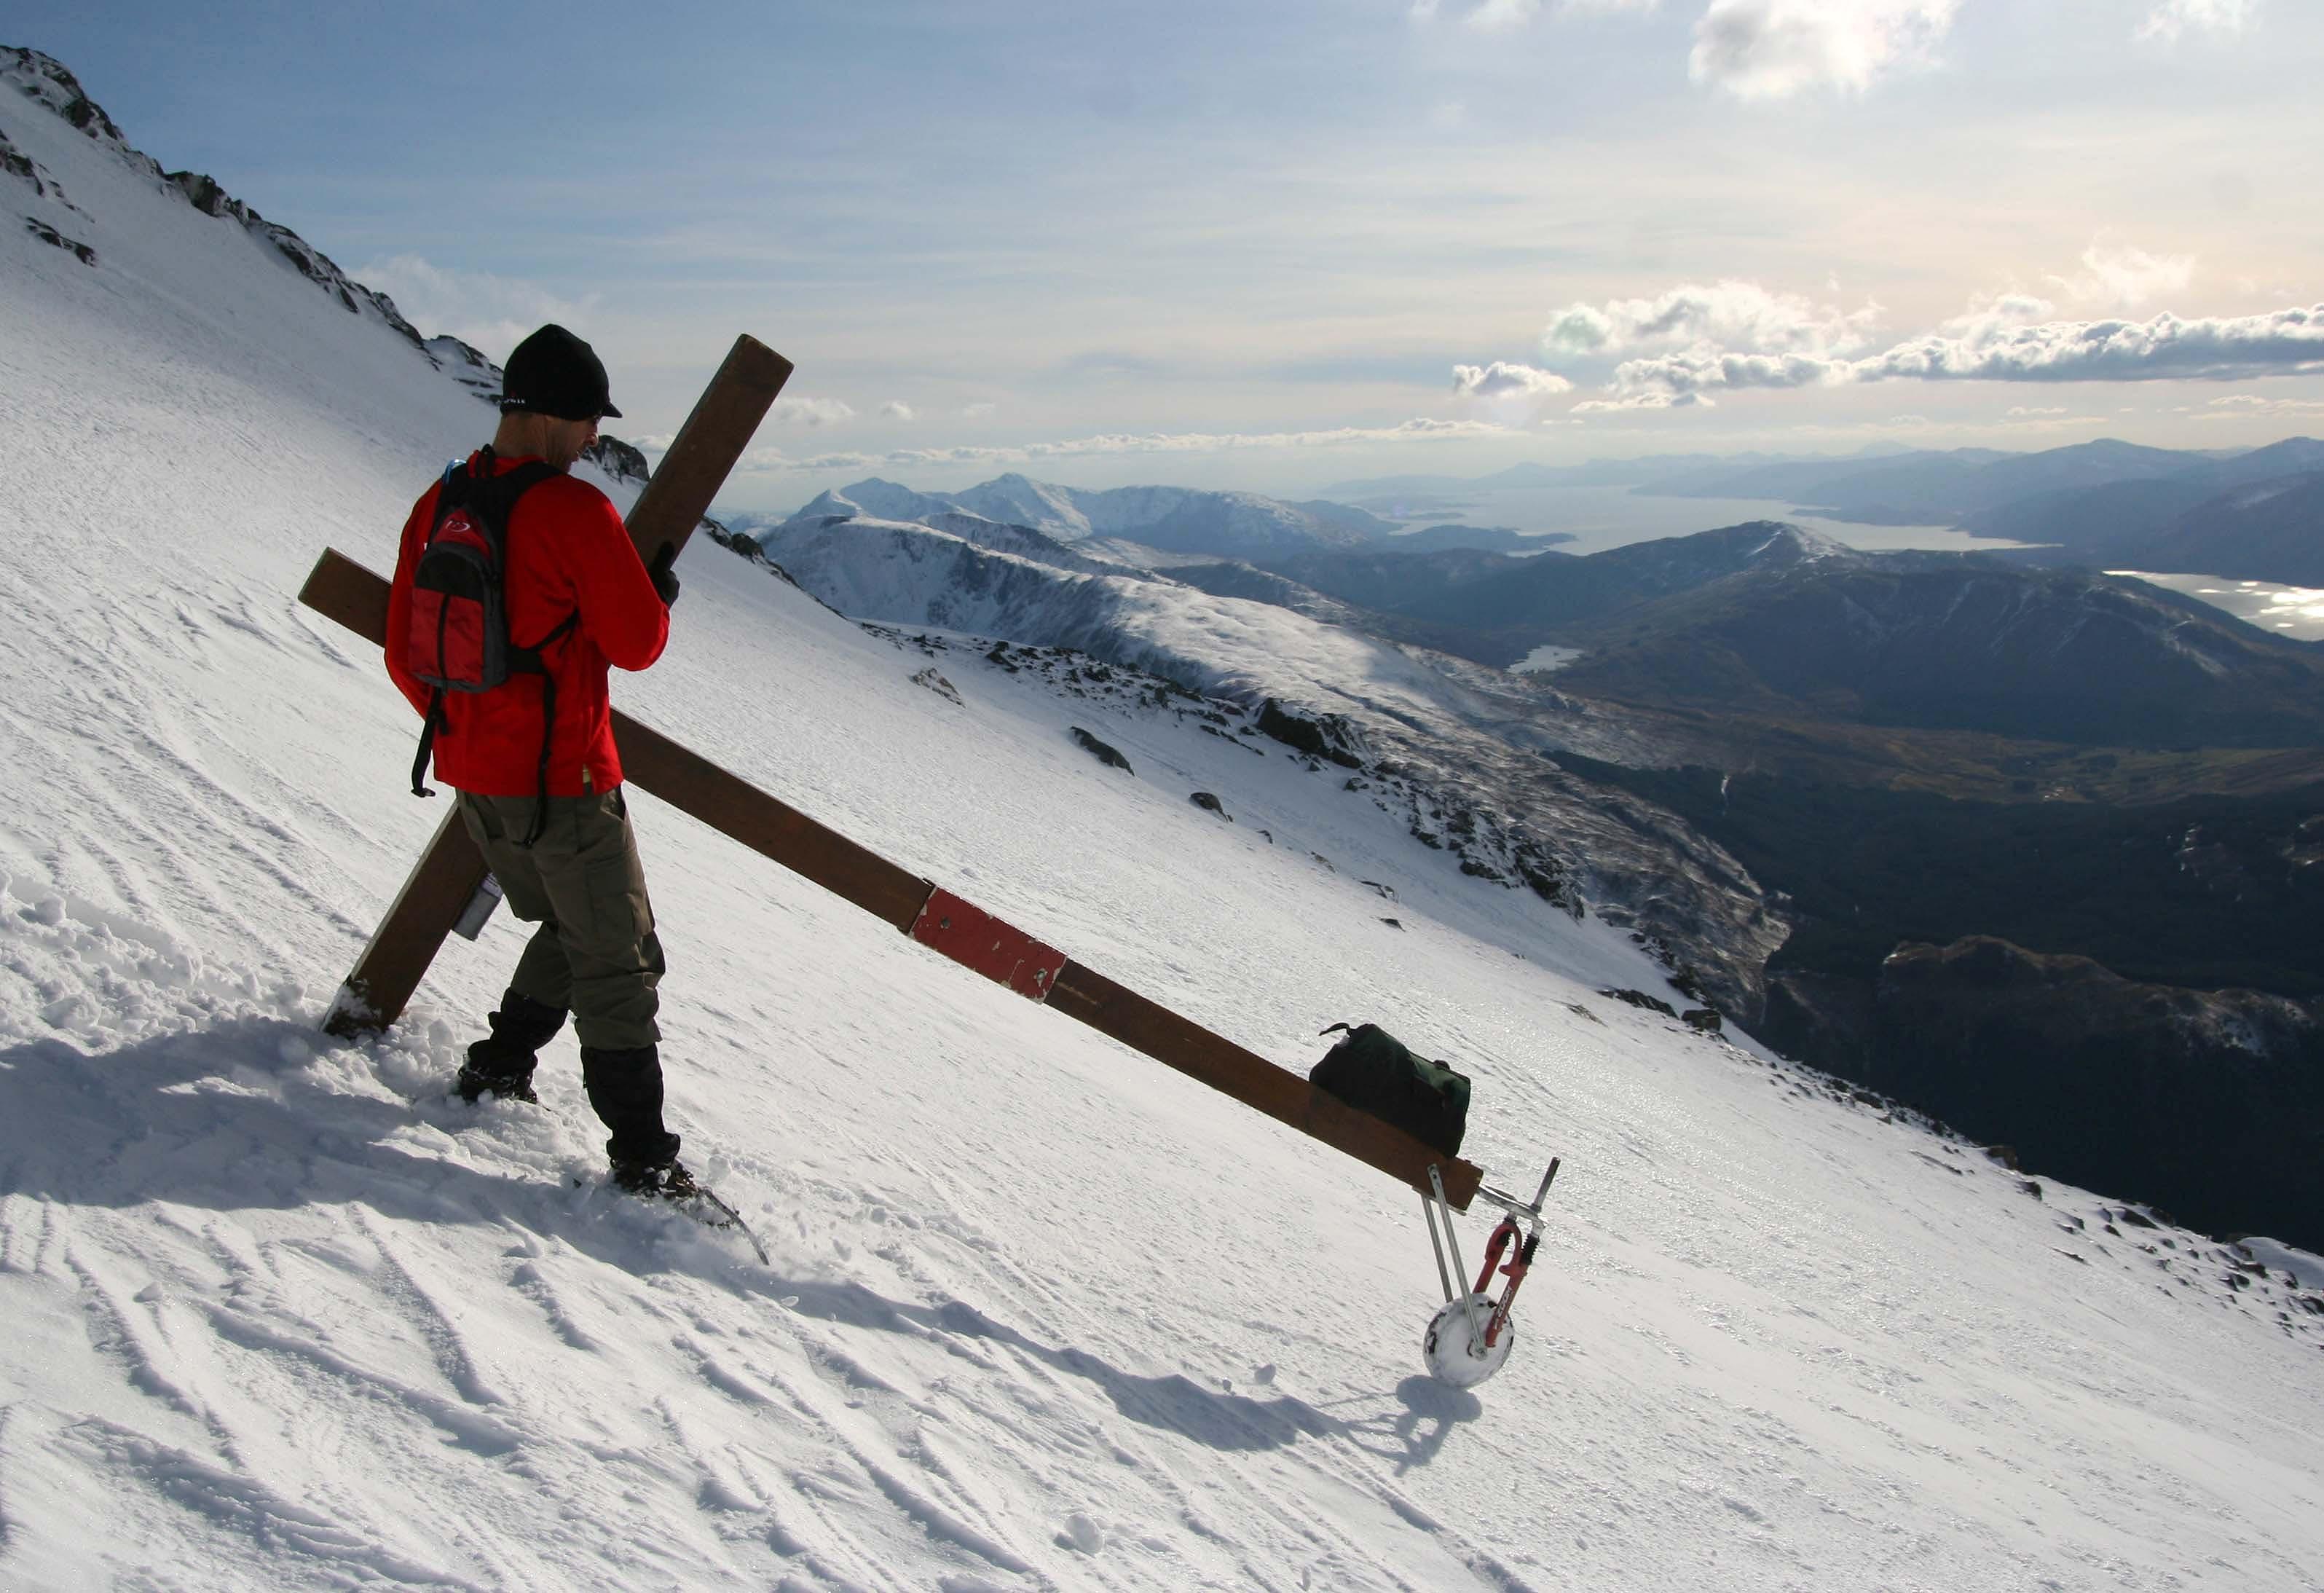 Counties evangelist Clive Cornish climbing Ben Nevis, Britain's highest mountain, in deep snow with his cross